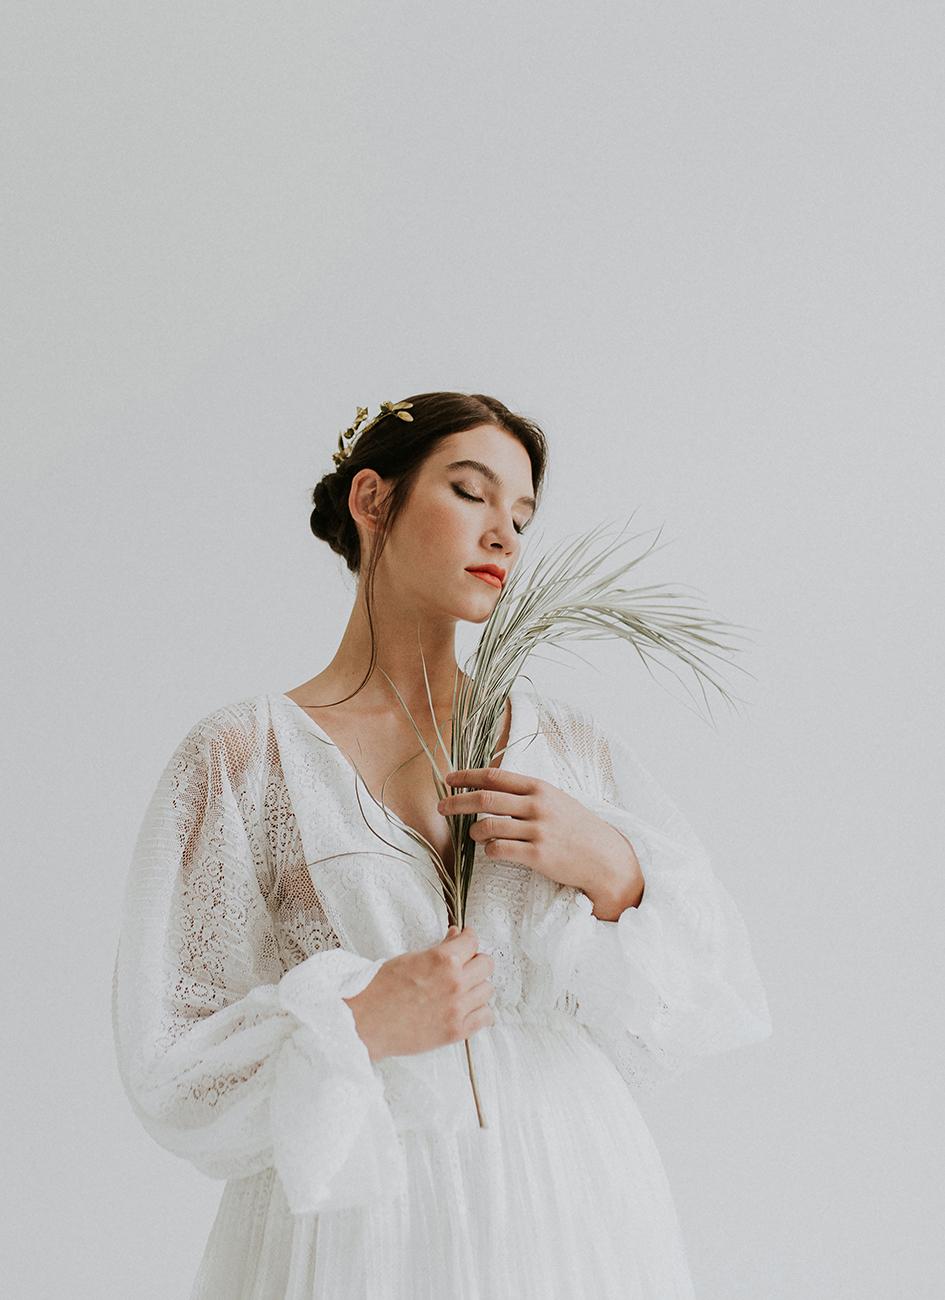 eskuco-classic-viseljhazait-menyasszonyi-ruha-tervezo-hey-darling-foto-jagity-fanni.jpg